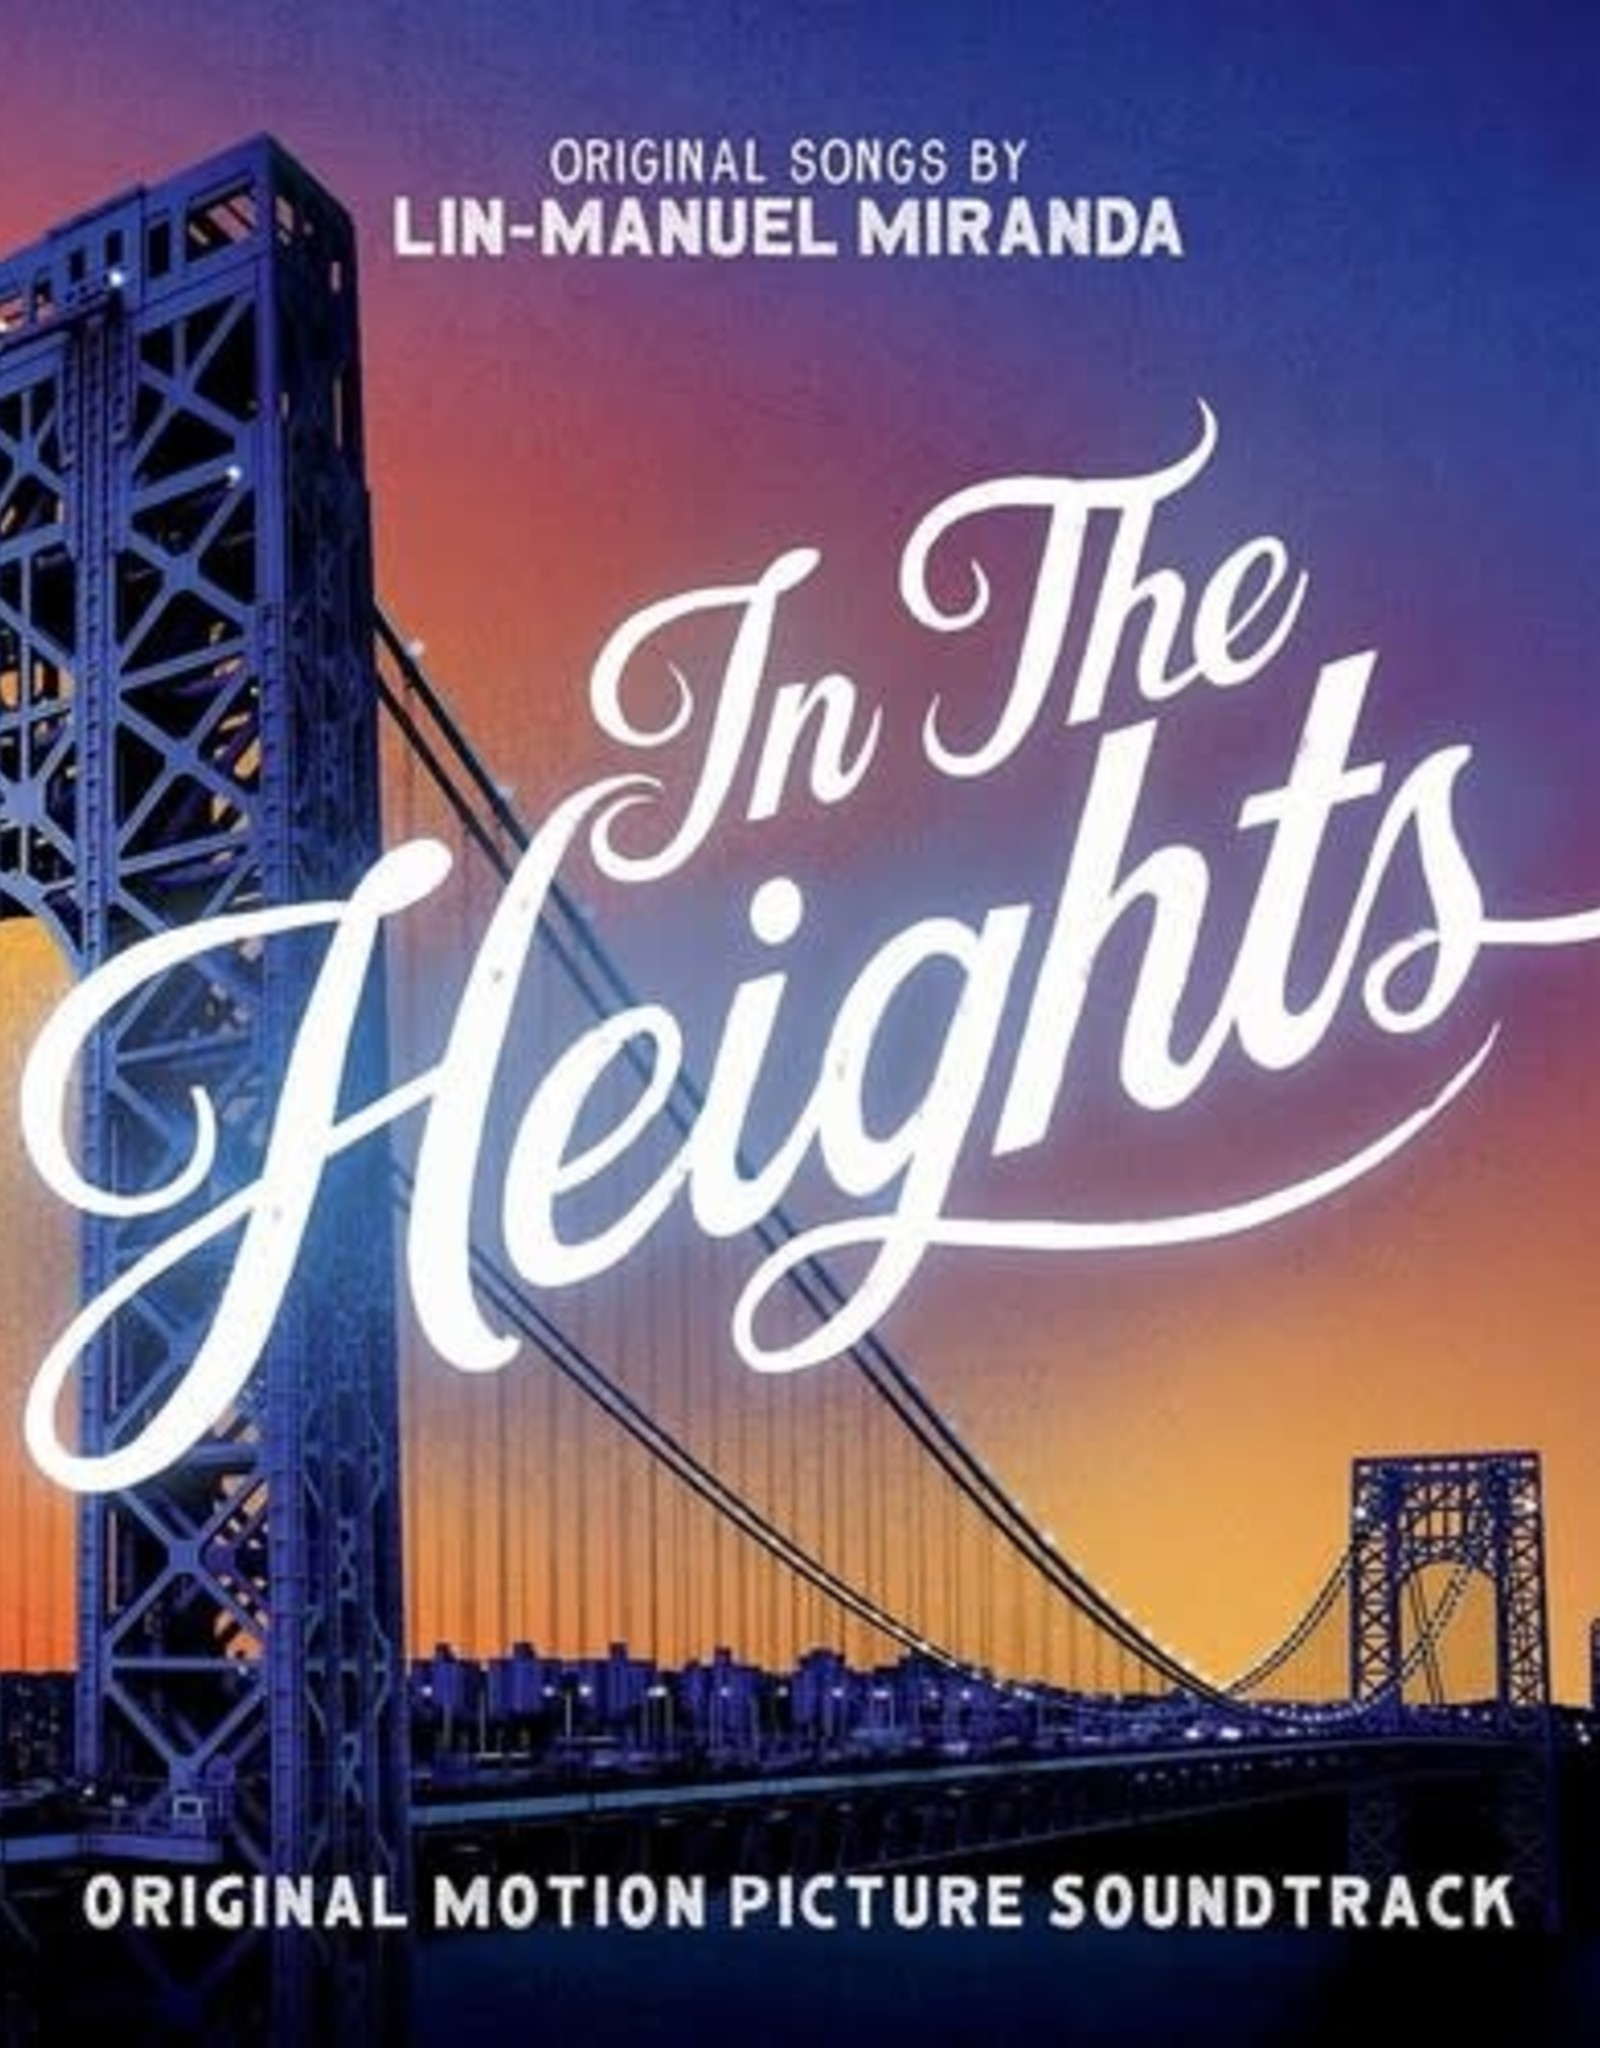 Lin-Manuel Miranda - In the Heights (OST)